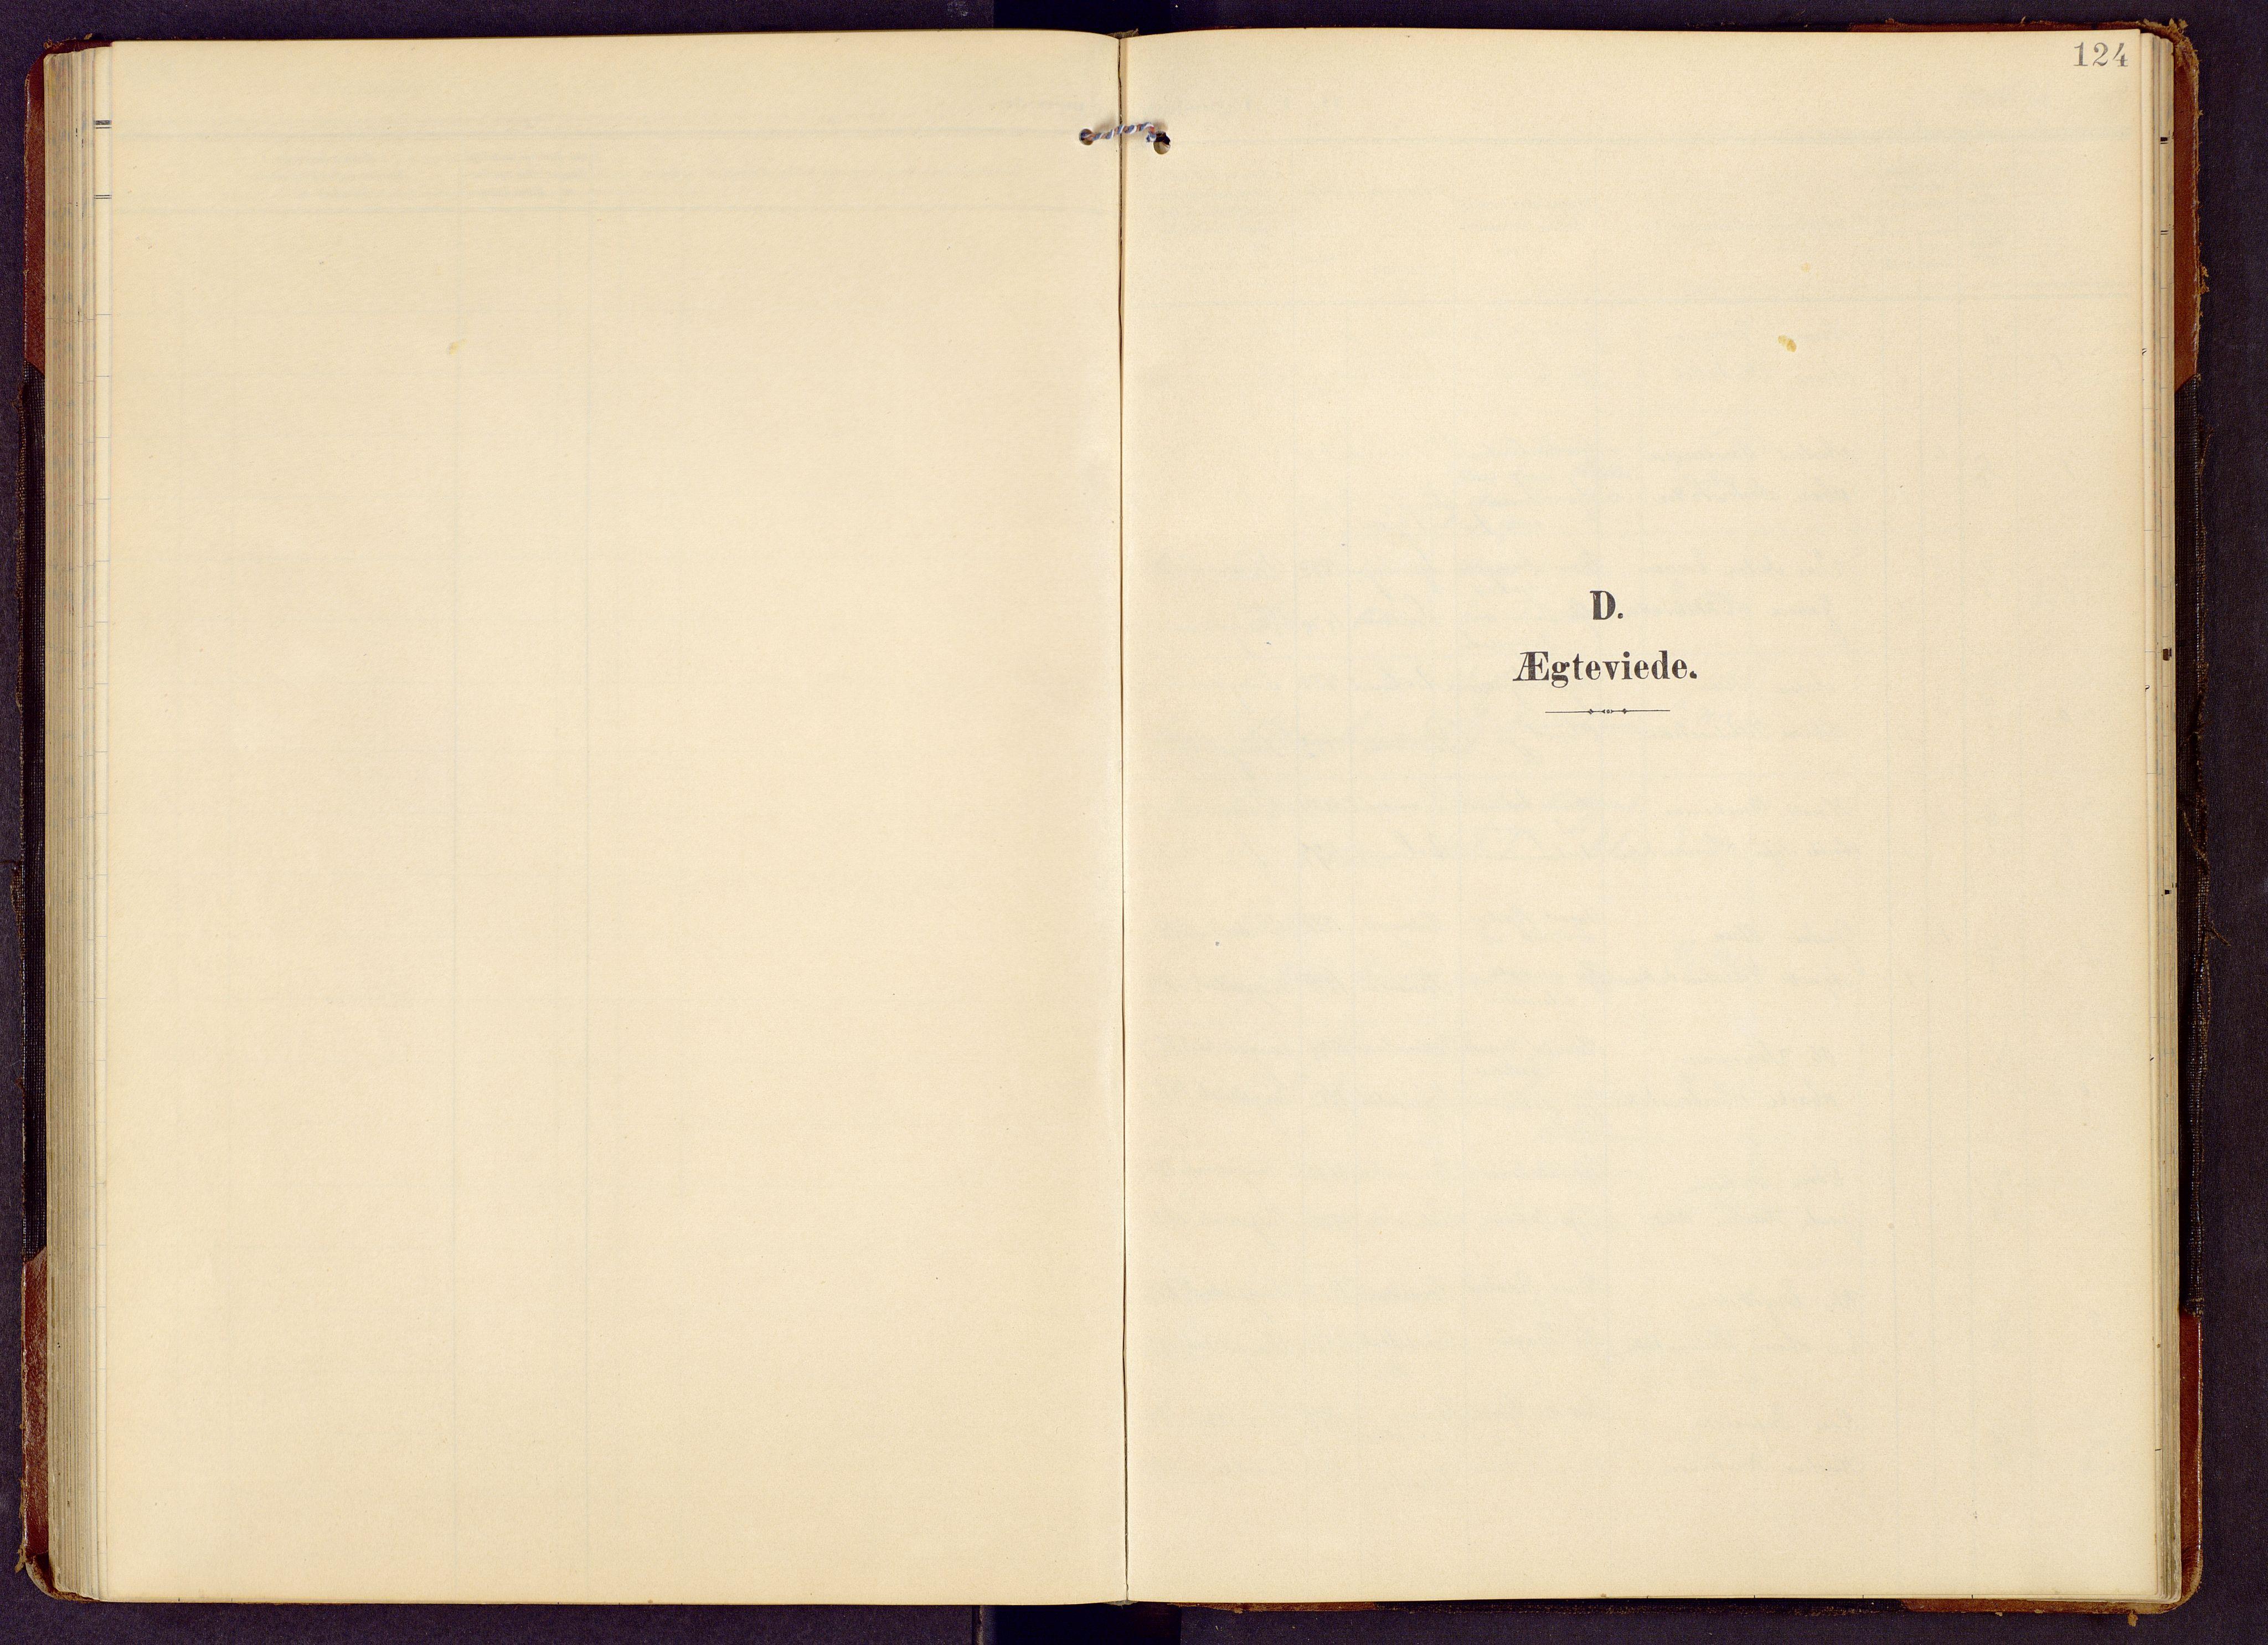 SAH, Brandbu prestekontor, Klokkerbok nr. 9, 1903-1916, s. 124